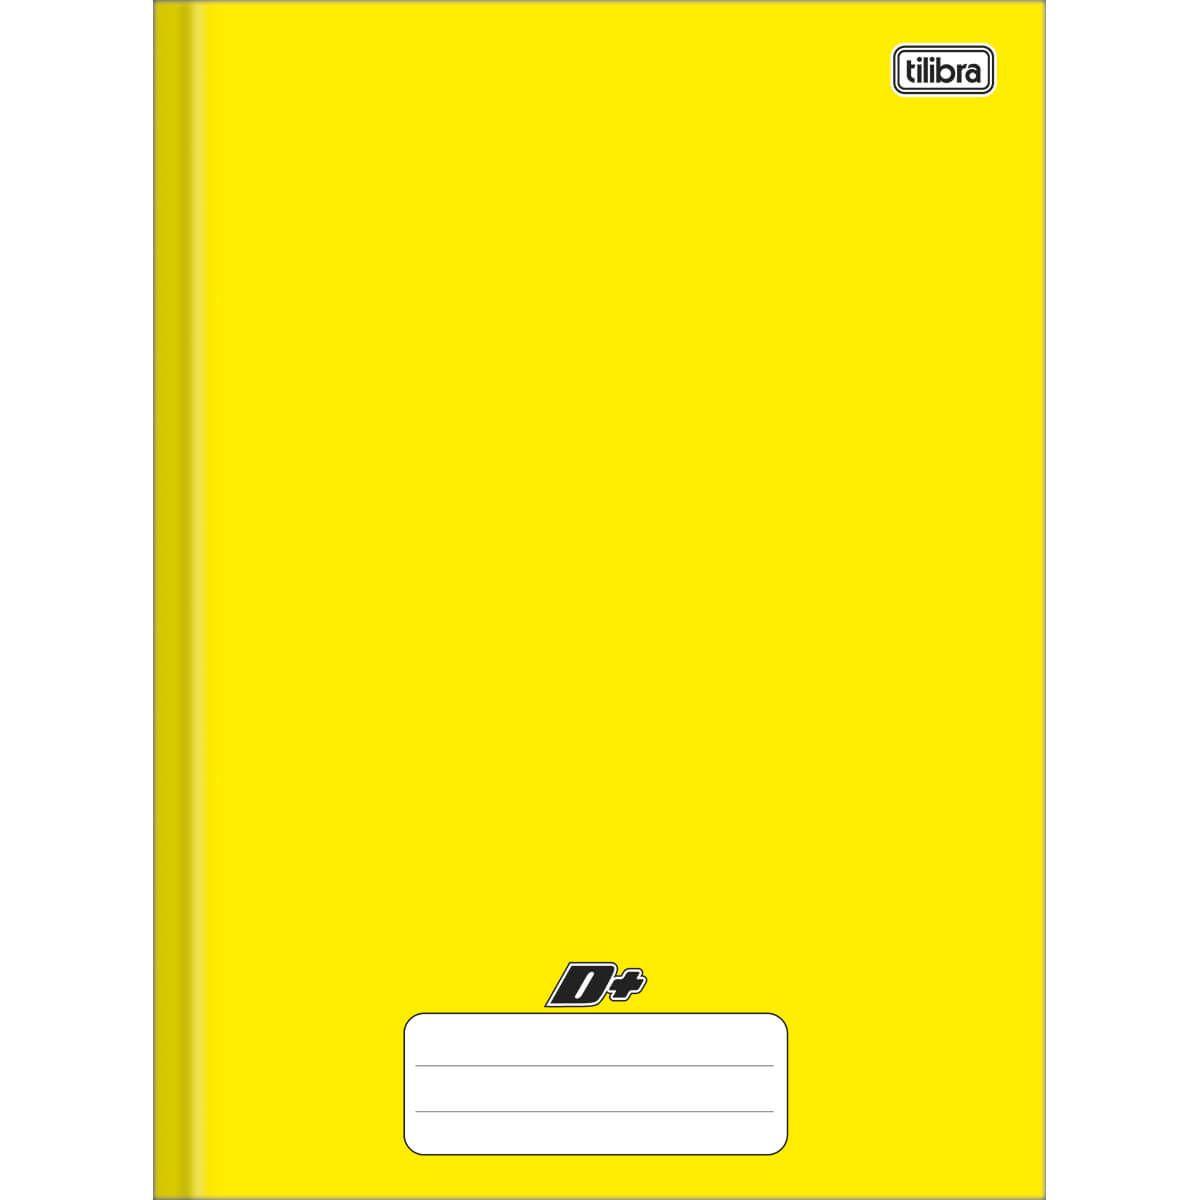 Caderno brochura 1/4 48 fls amarelo D+ Tilibra